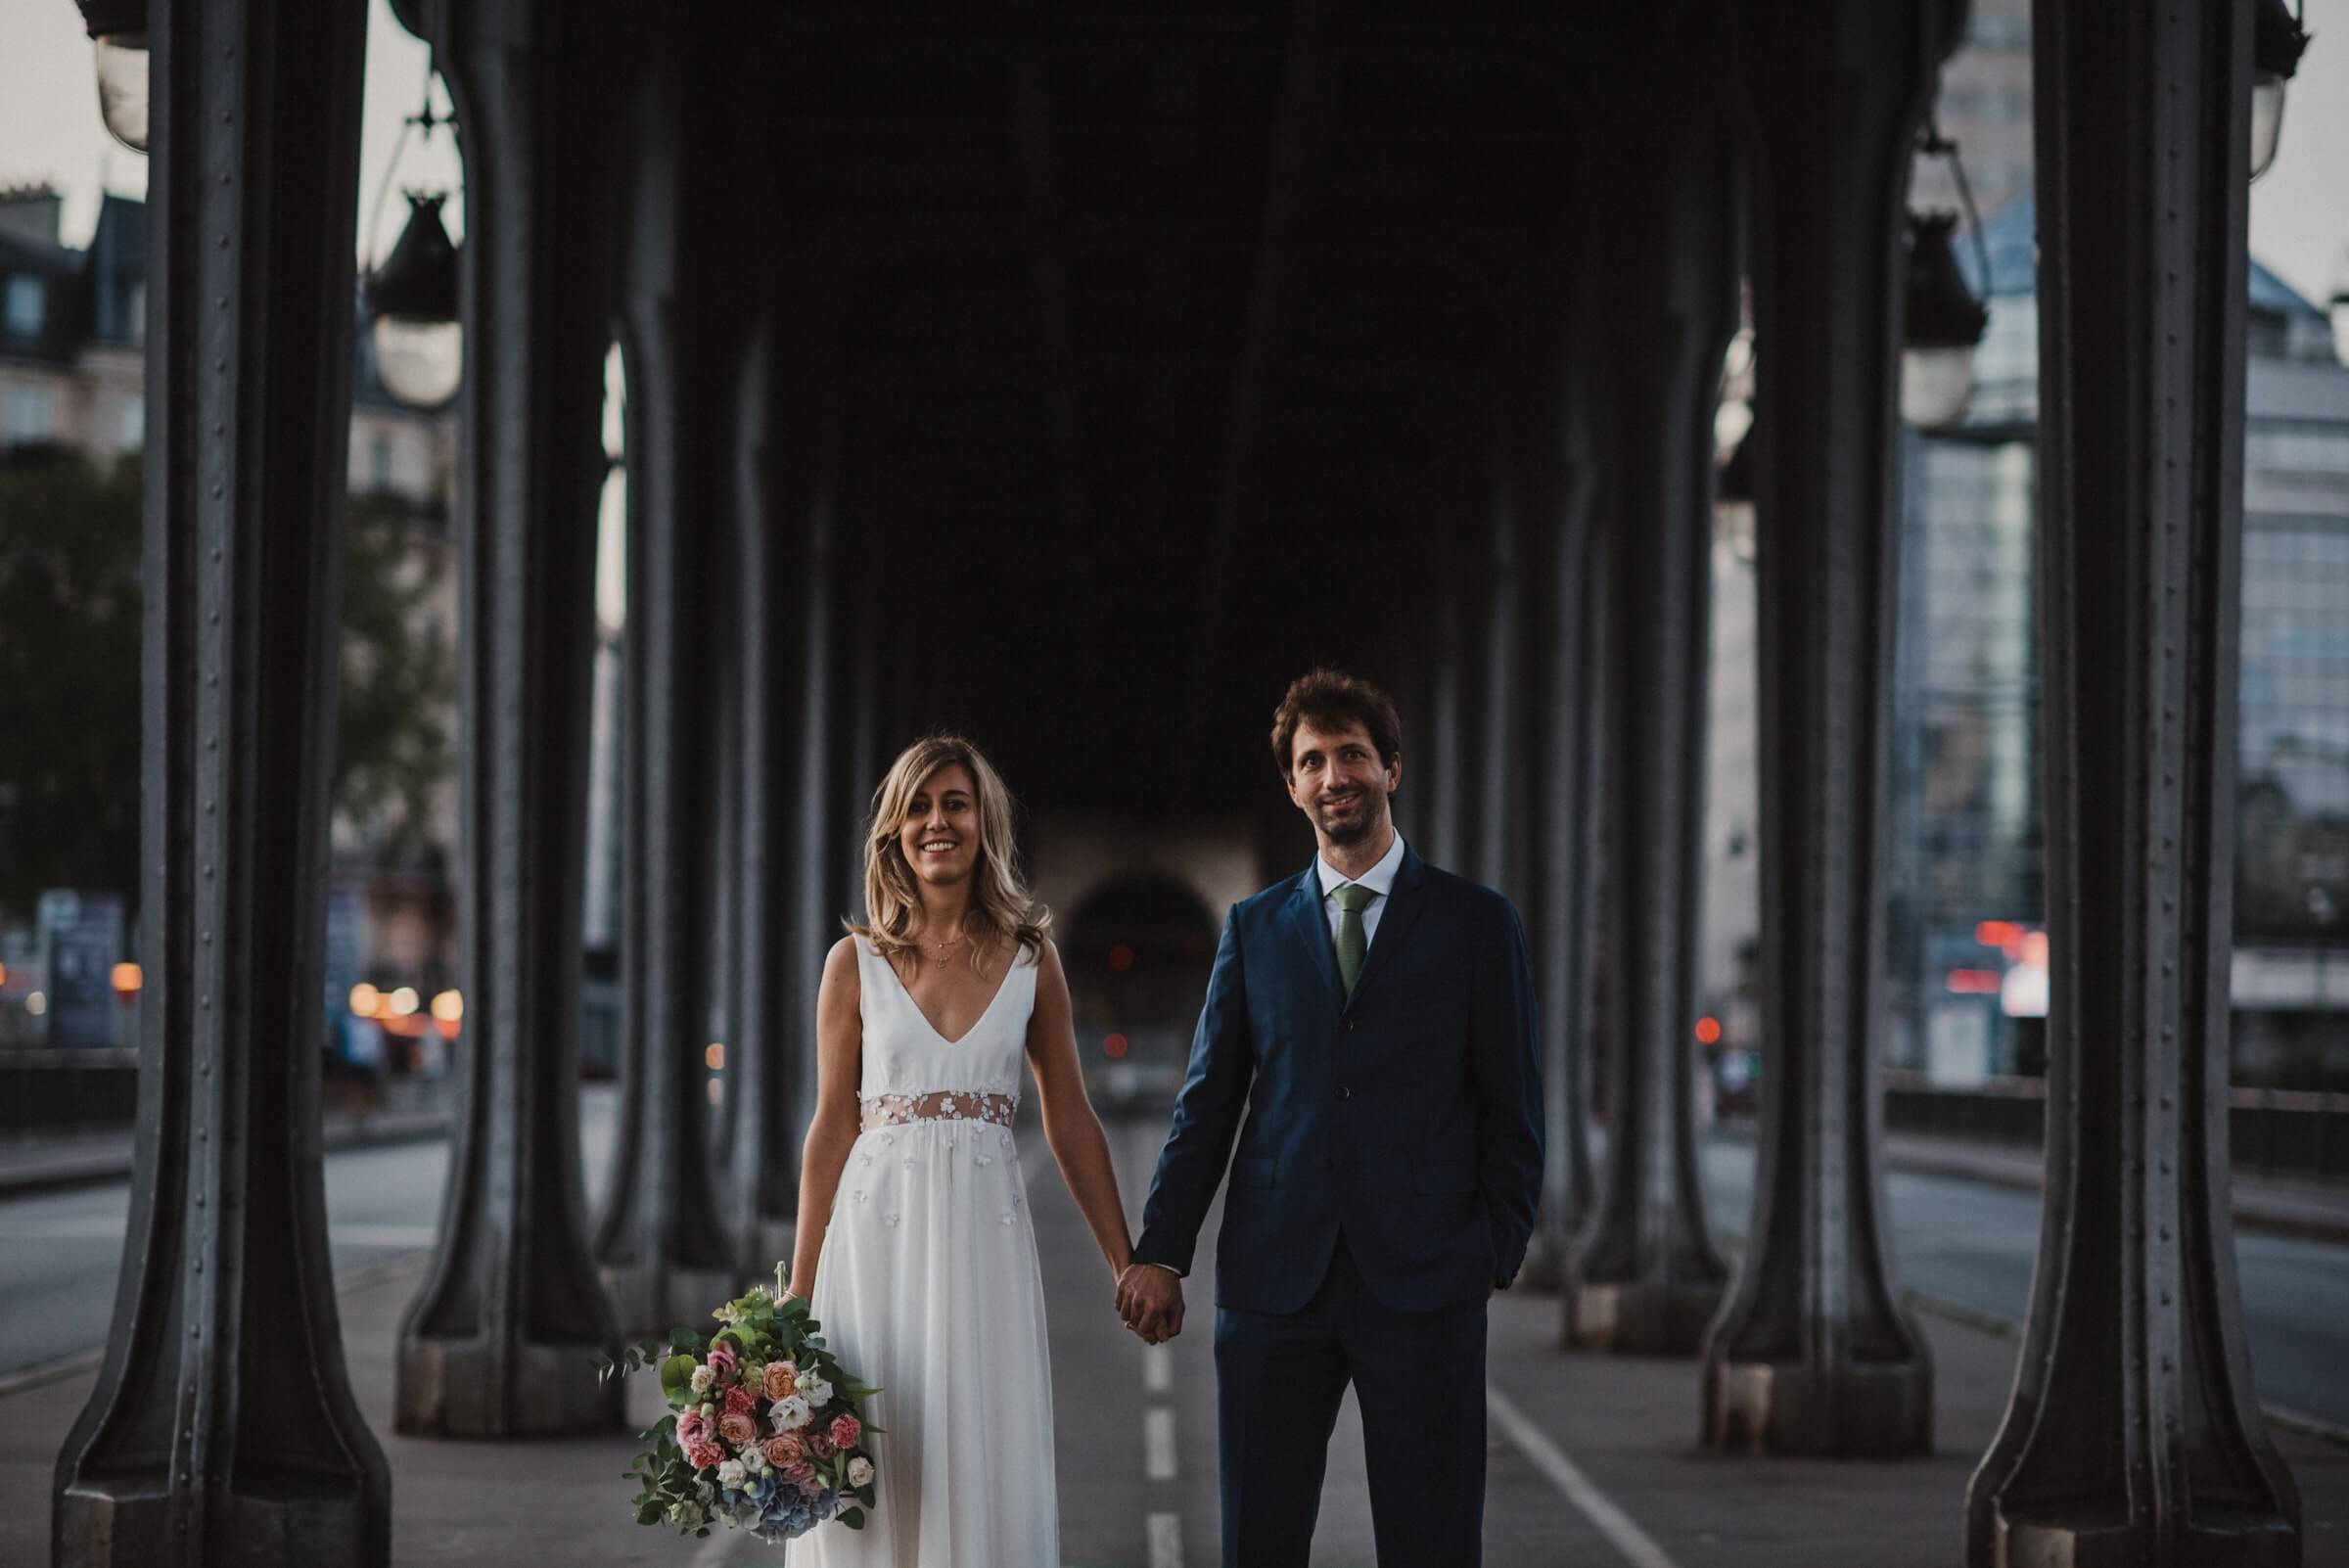 Fabio Miglio_wedding_europe-1-min